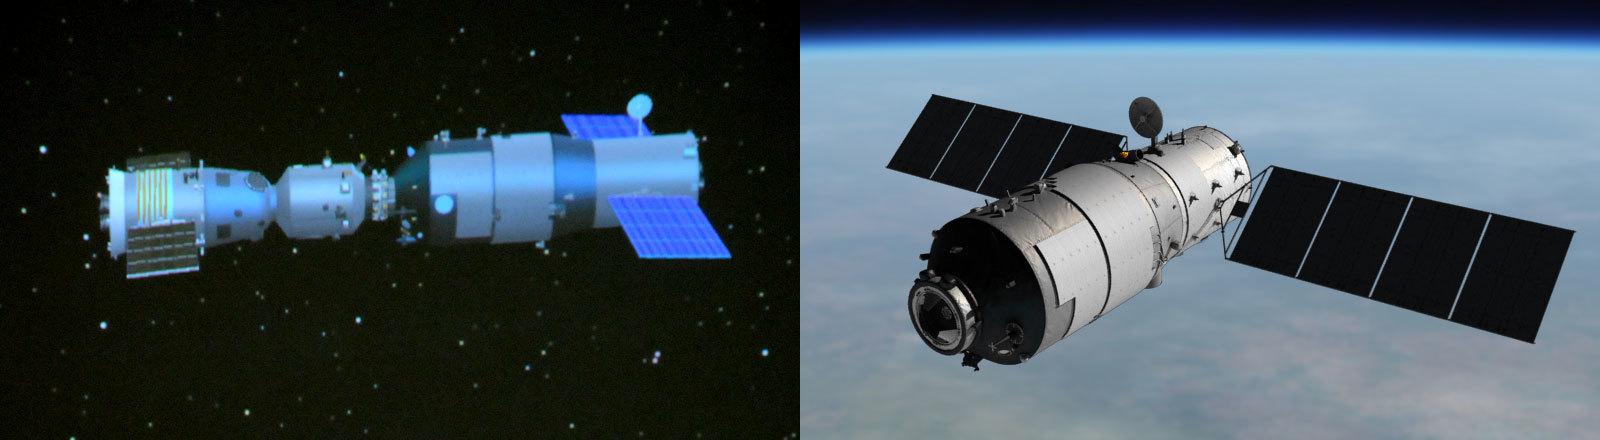 Raumstation Tiangong 1